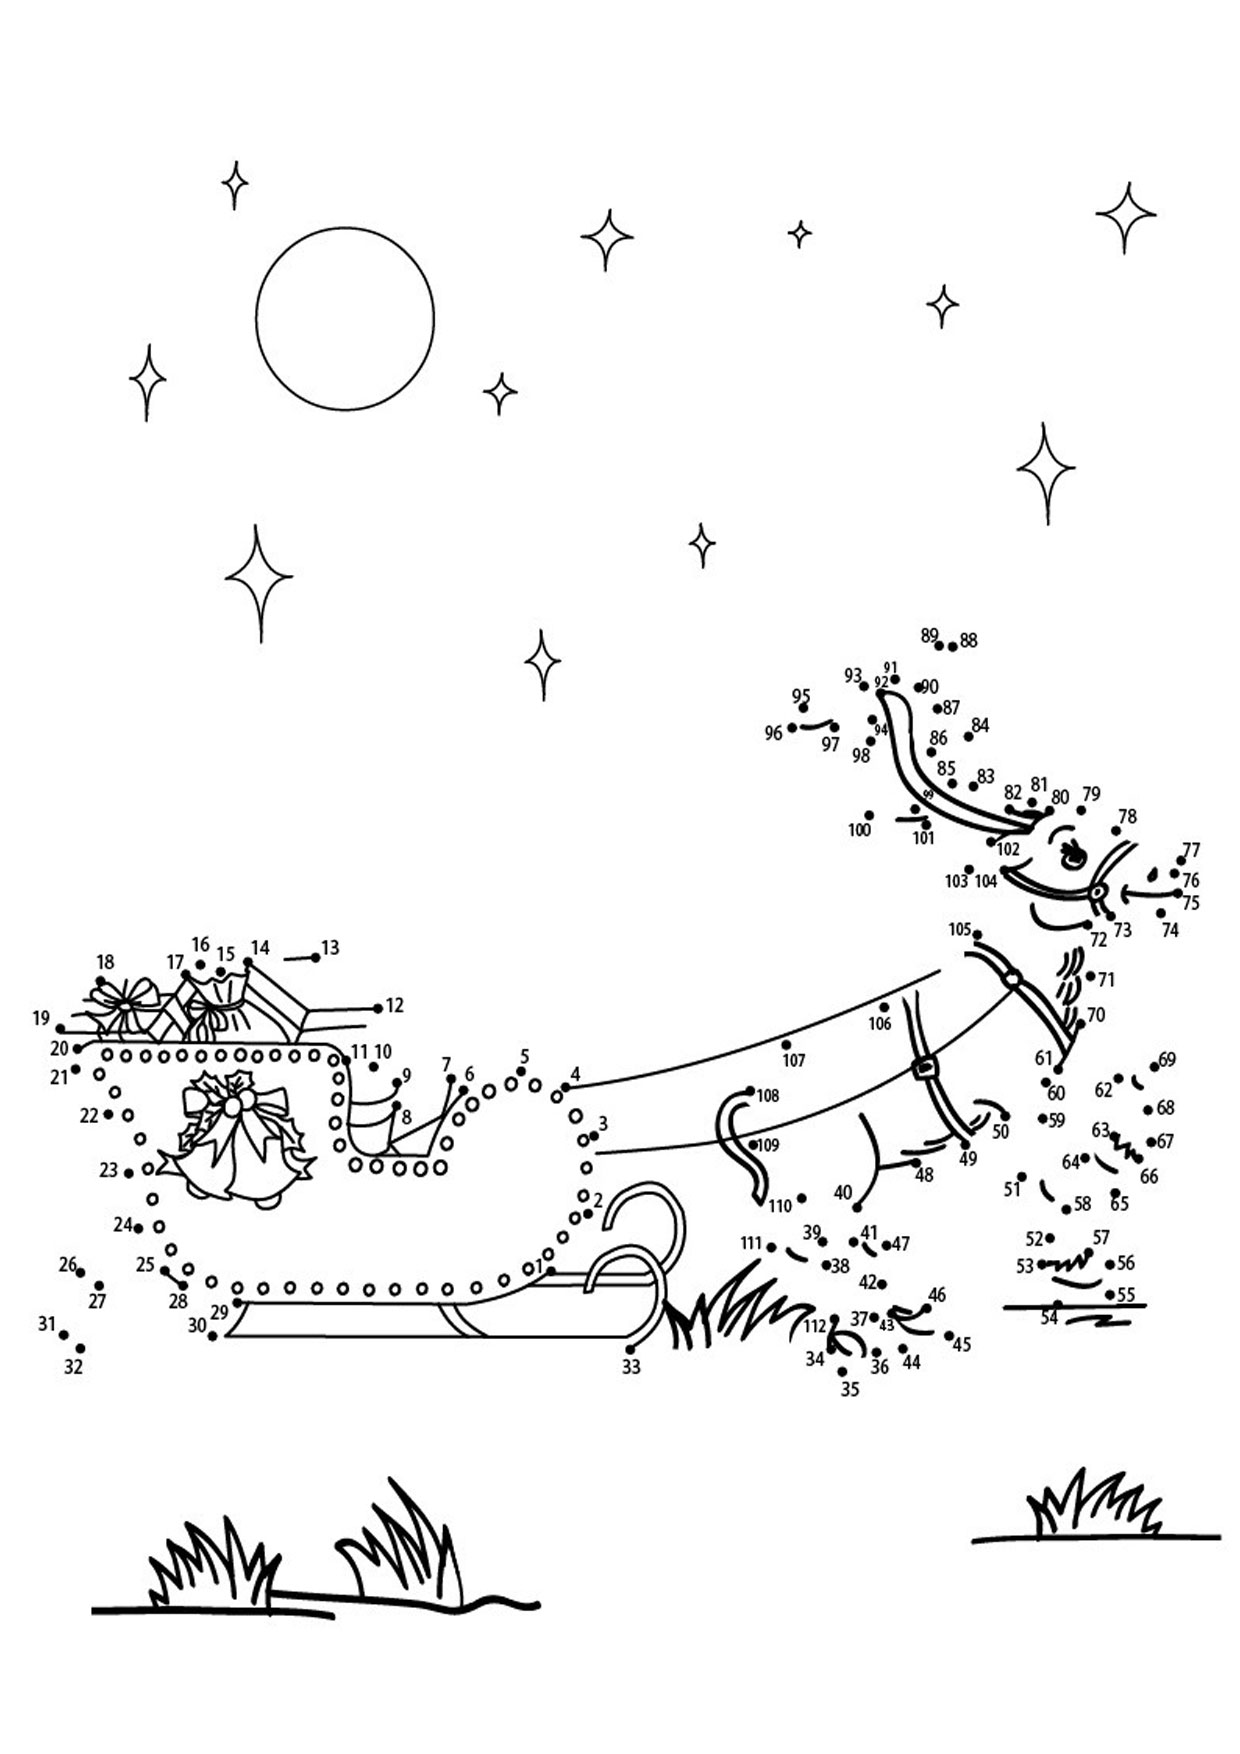 Unisci i puntini slitta di Babbo Natale 1-112